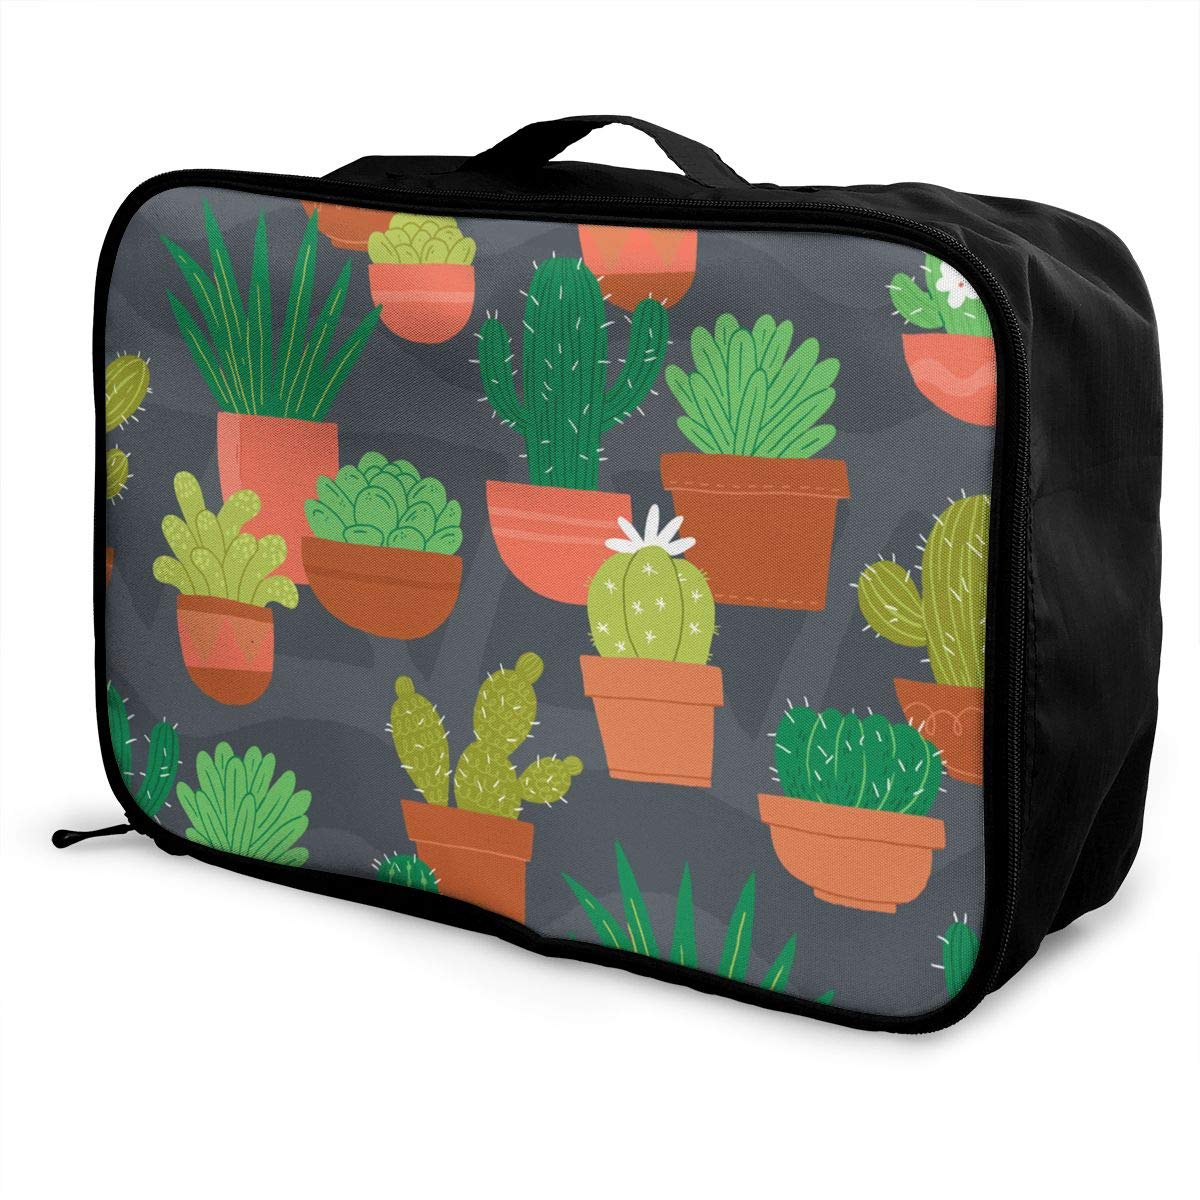 Cactus Flower Pot Travel Duffel Bag Waterproof Fashion Lightweight Large Capacity Portable Luggage Bag